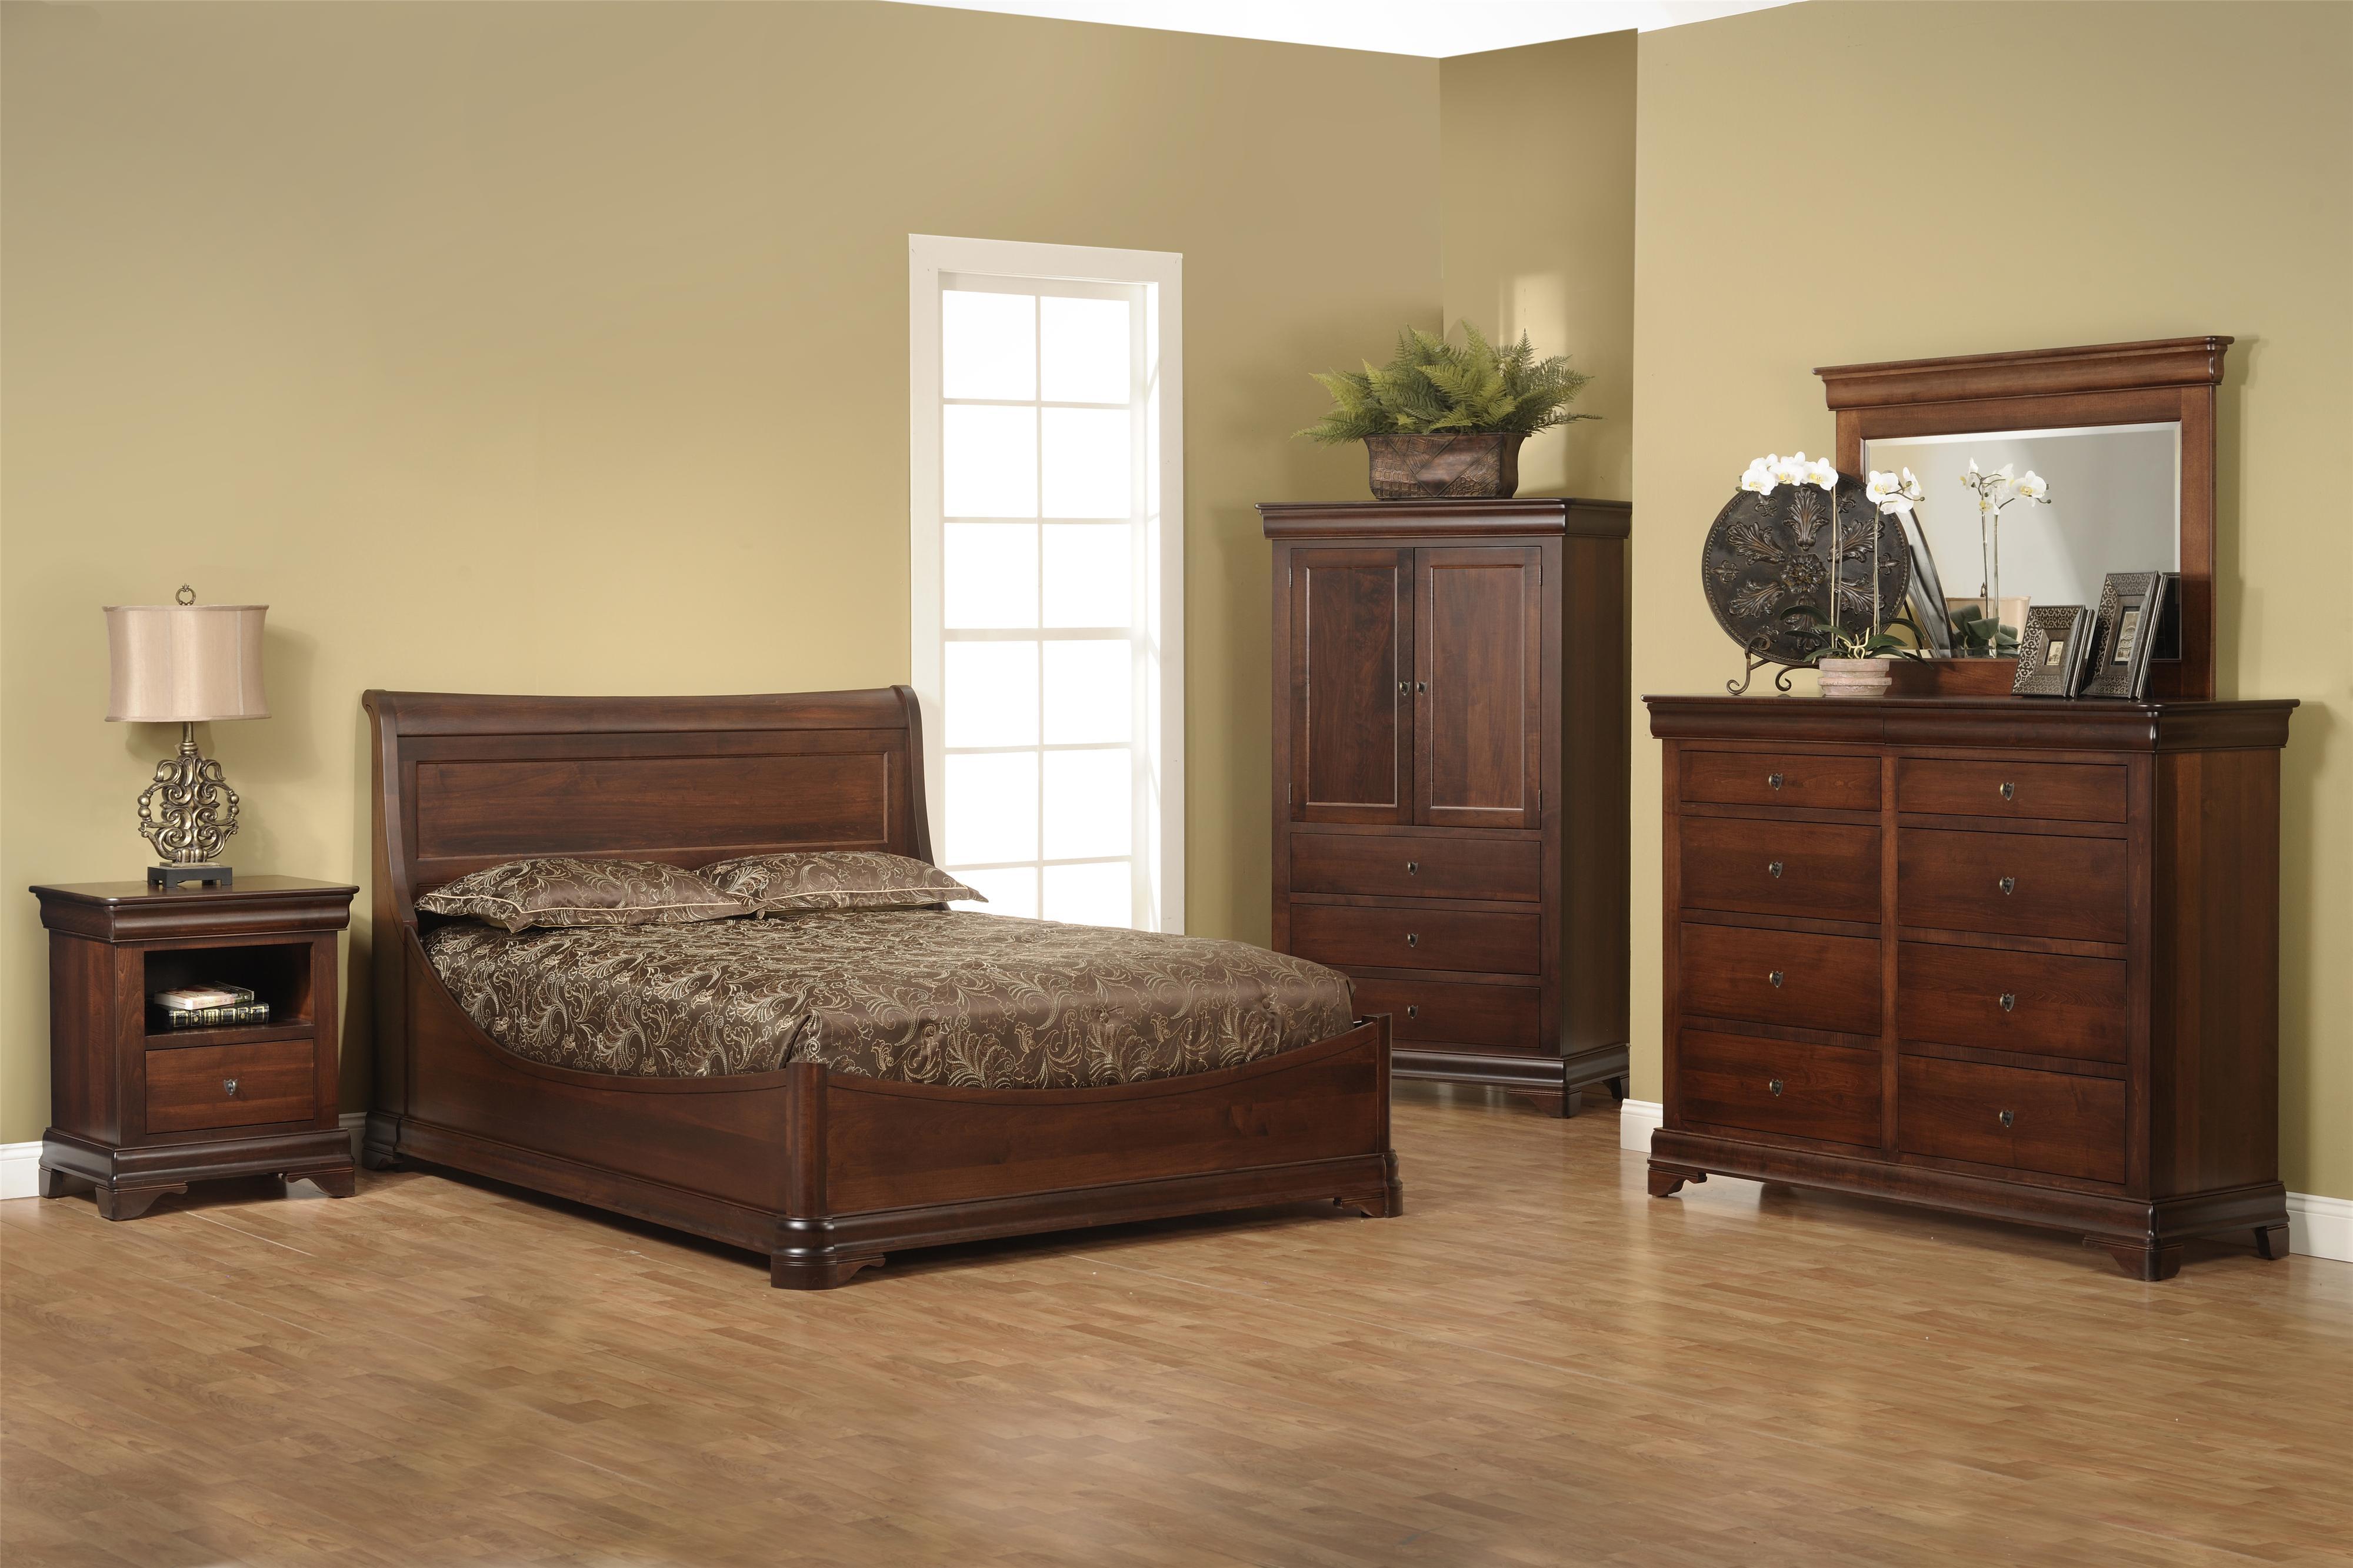 Versallies King Euro Bedroom Group by Millcraft at Saugerties Furniture Mart